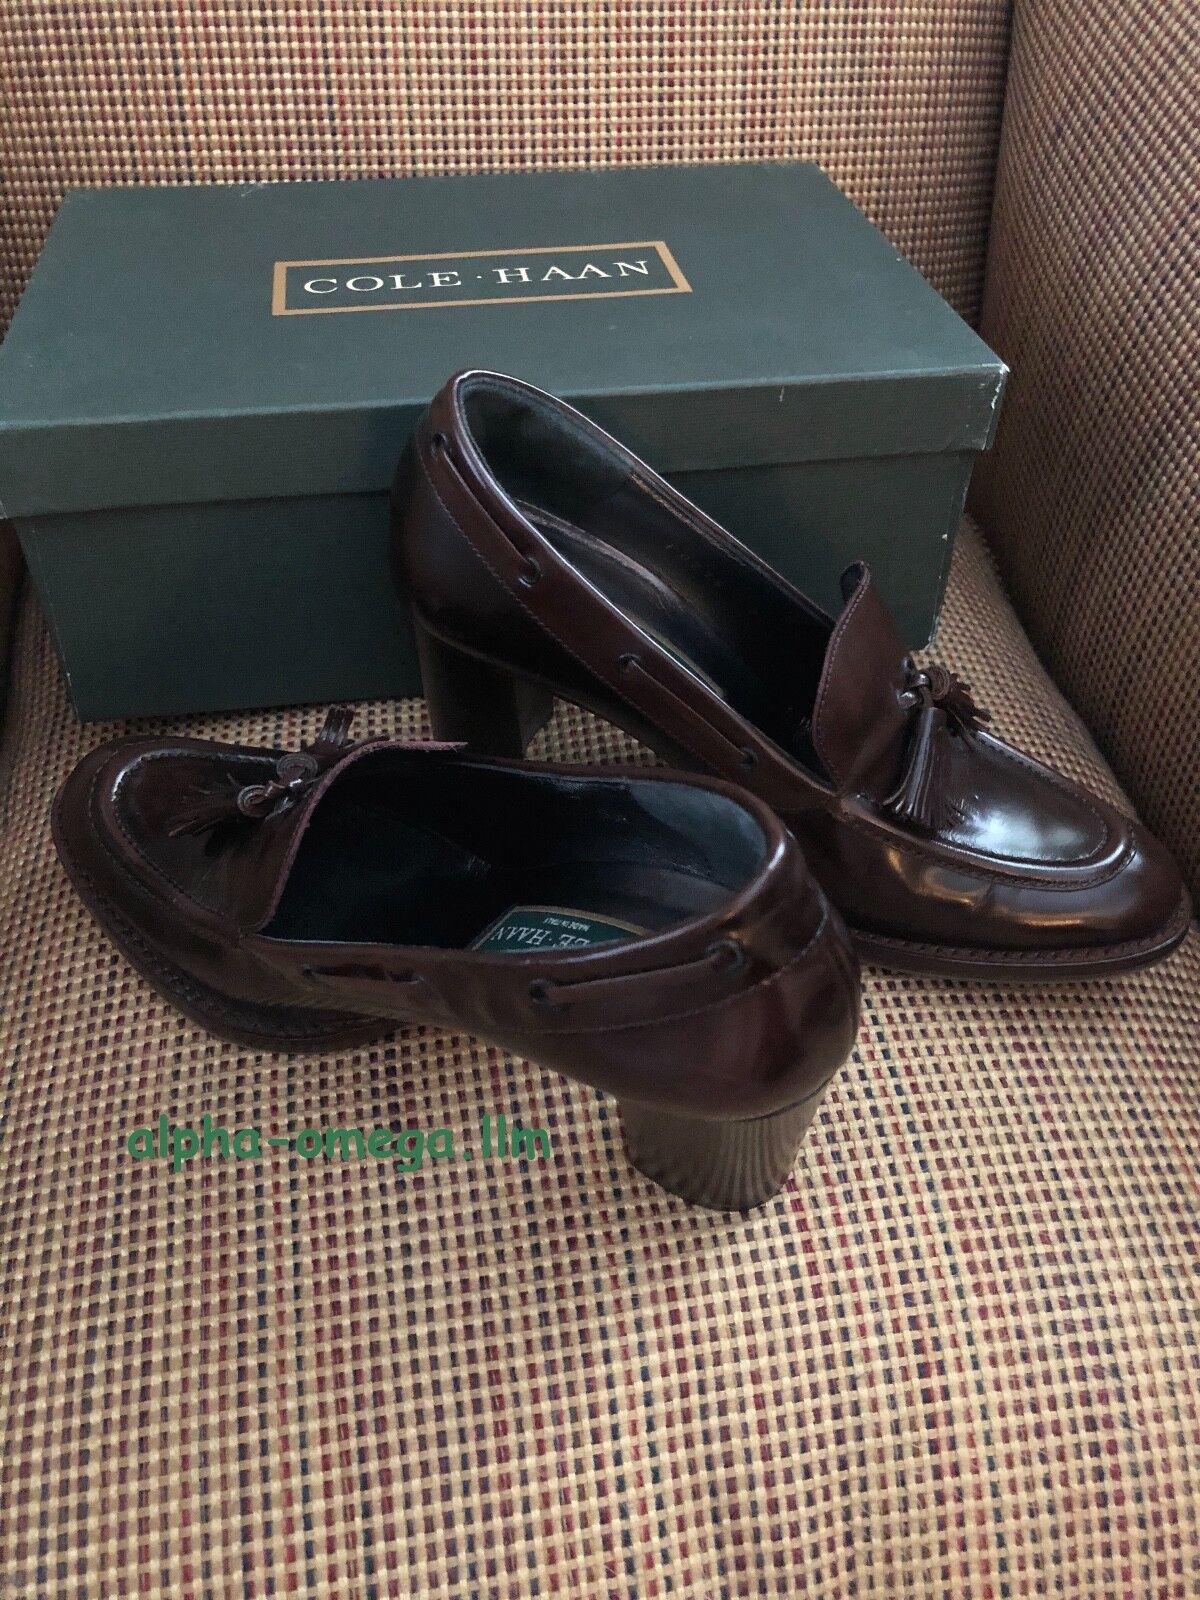 Cole Haan Women's KERRY Loafer-Block Heel-6.5-Brown Leather-Dressy--NIB